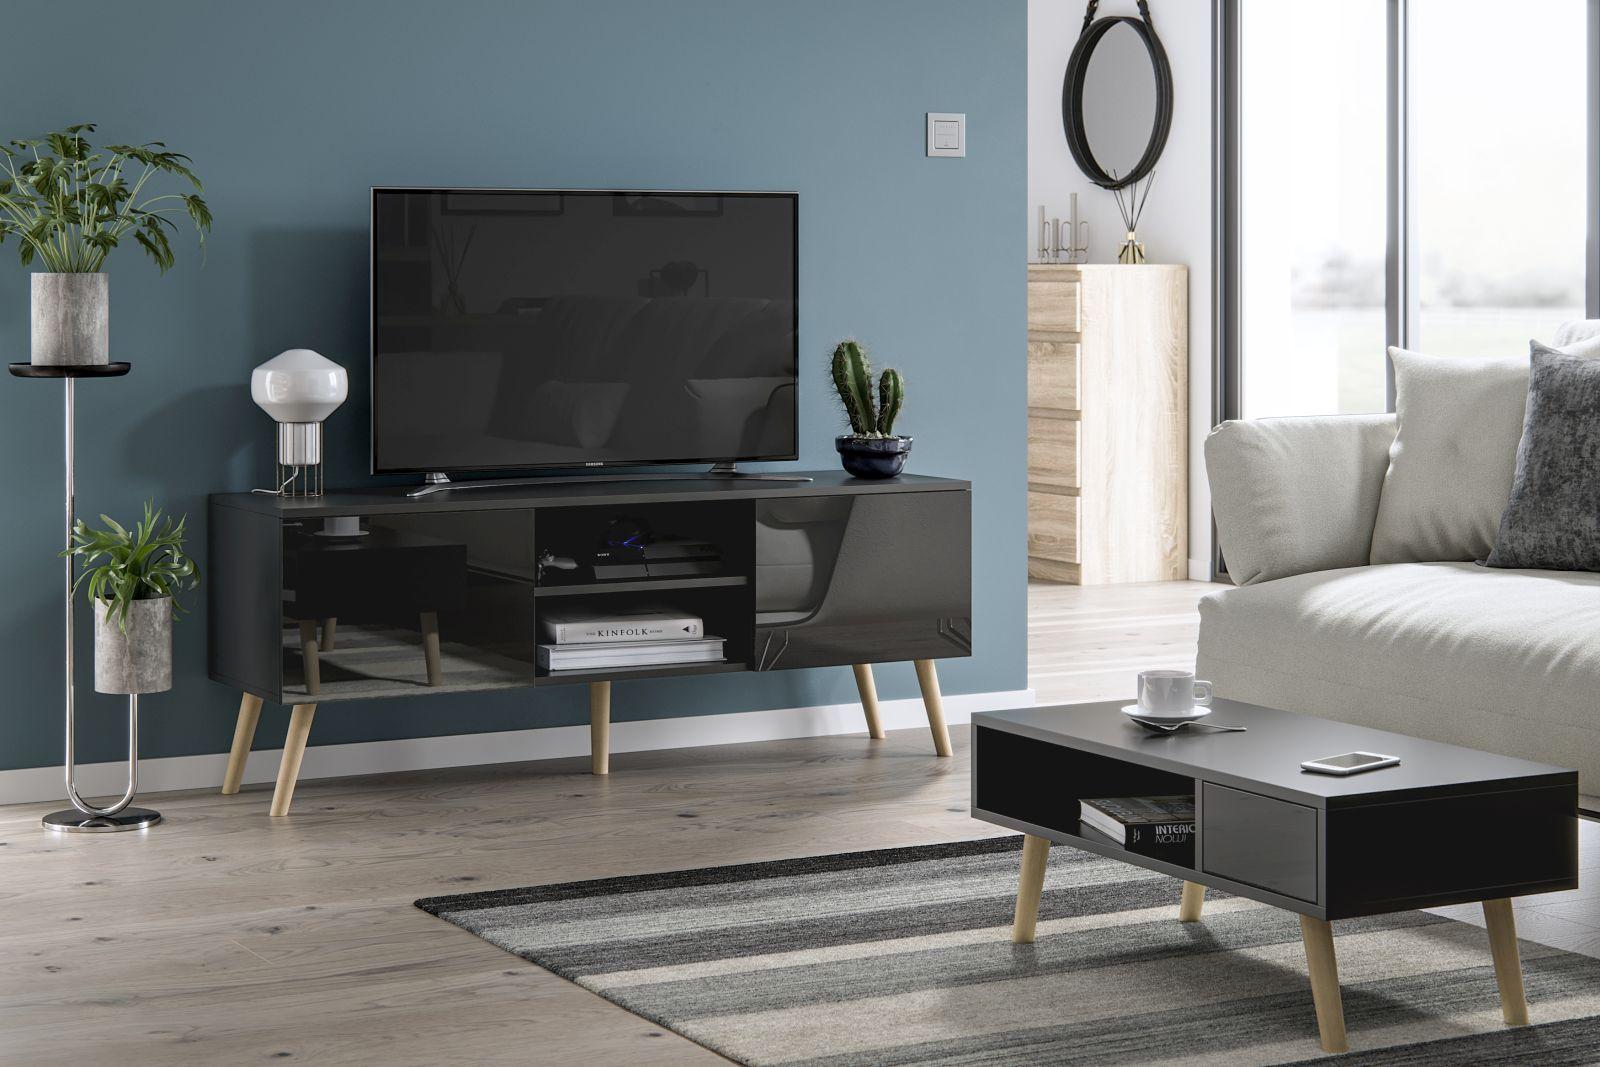 Scandinavian Style Living Room Set Tv Cabinet Coffee Table